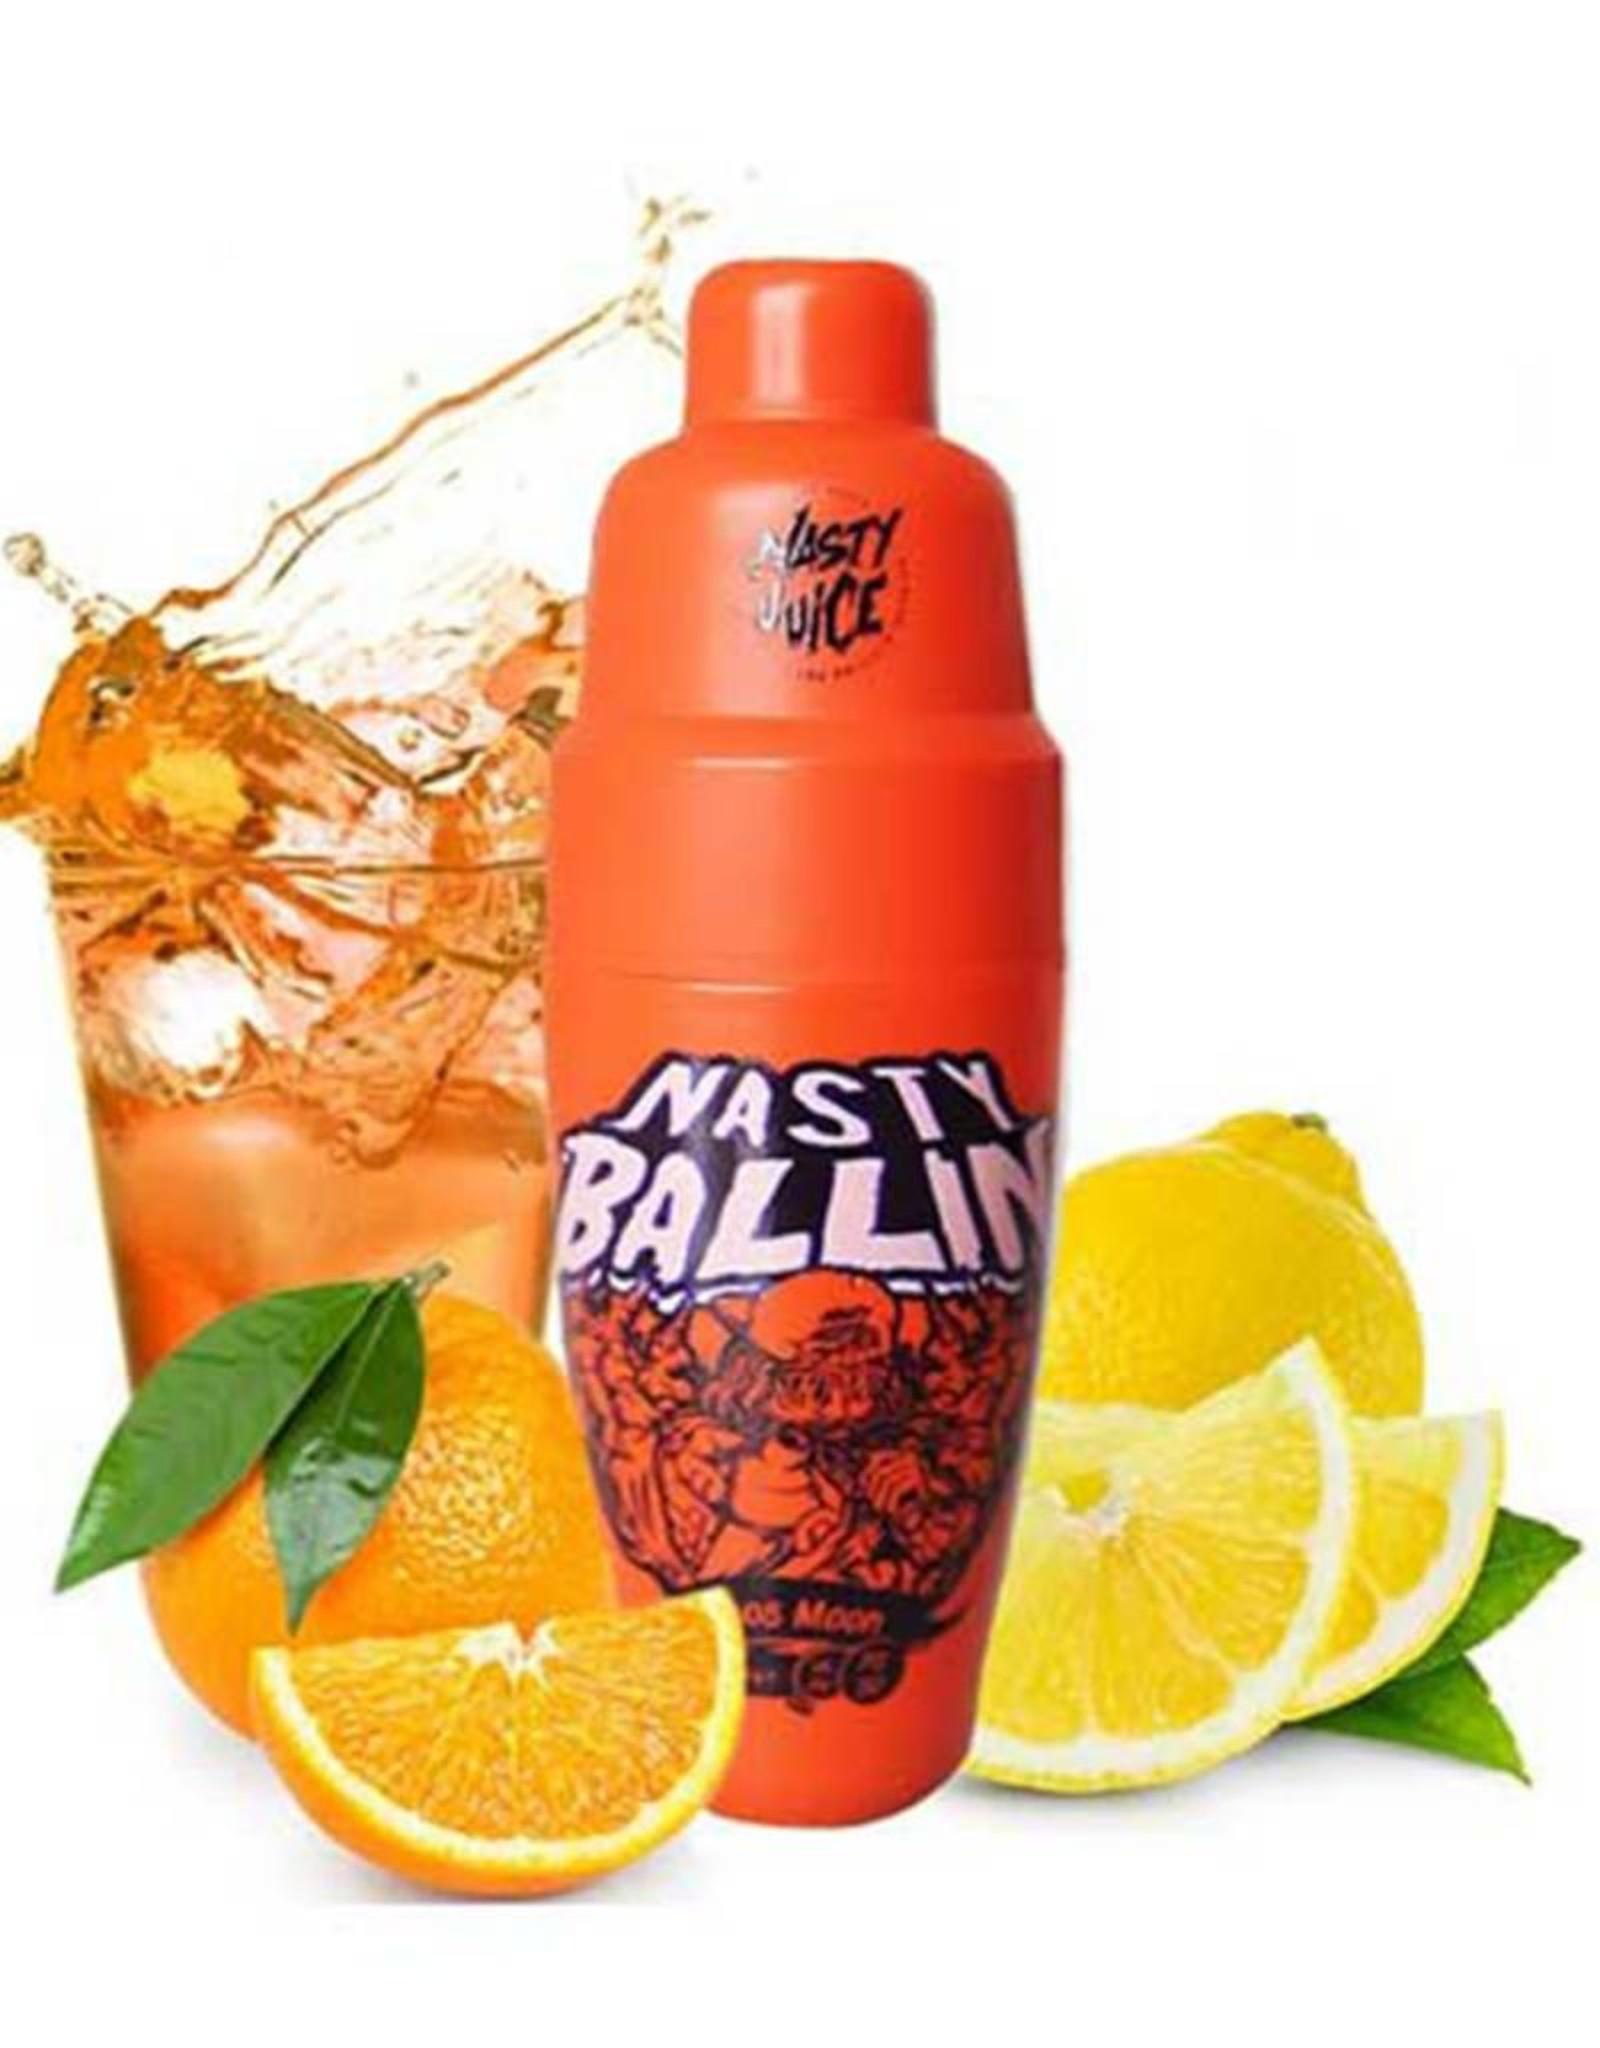 Nasty Juice - Migos Moon (Ballin Line) (60mL)